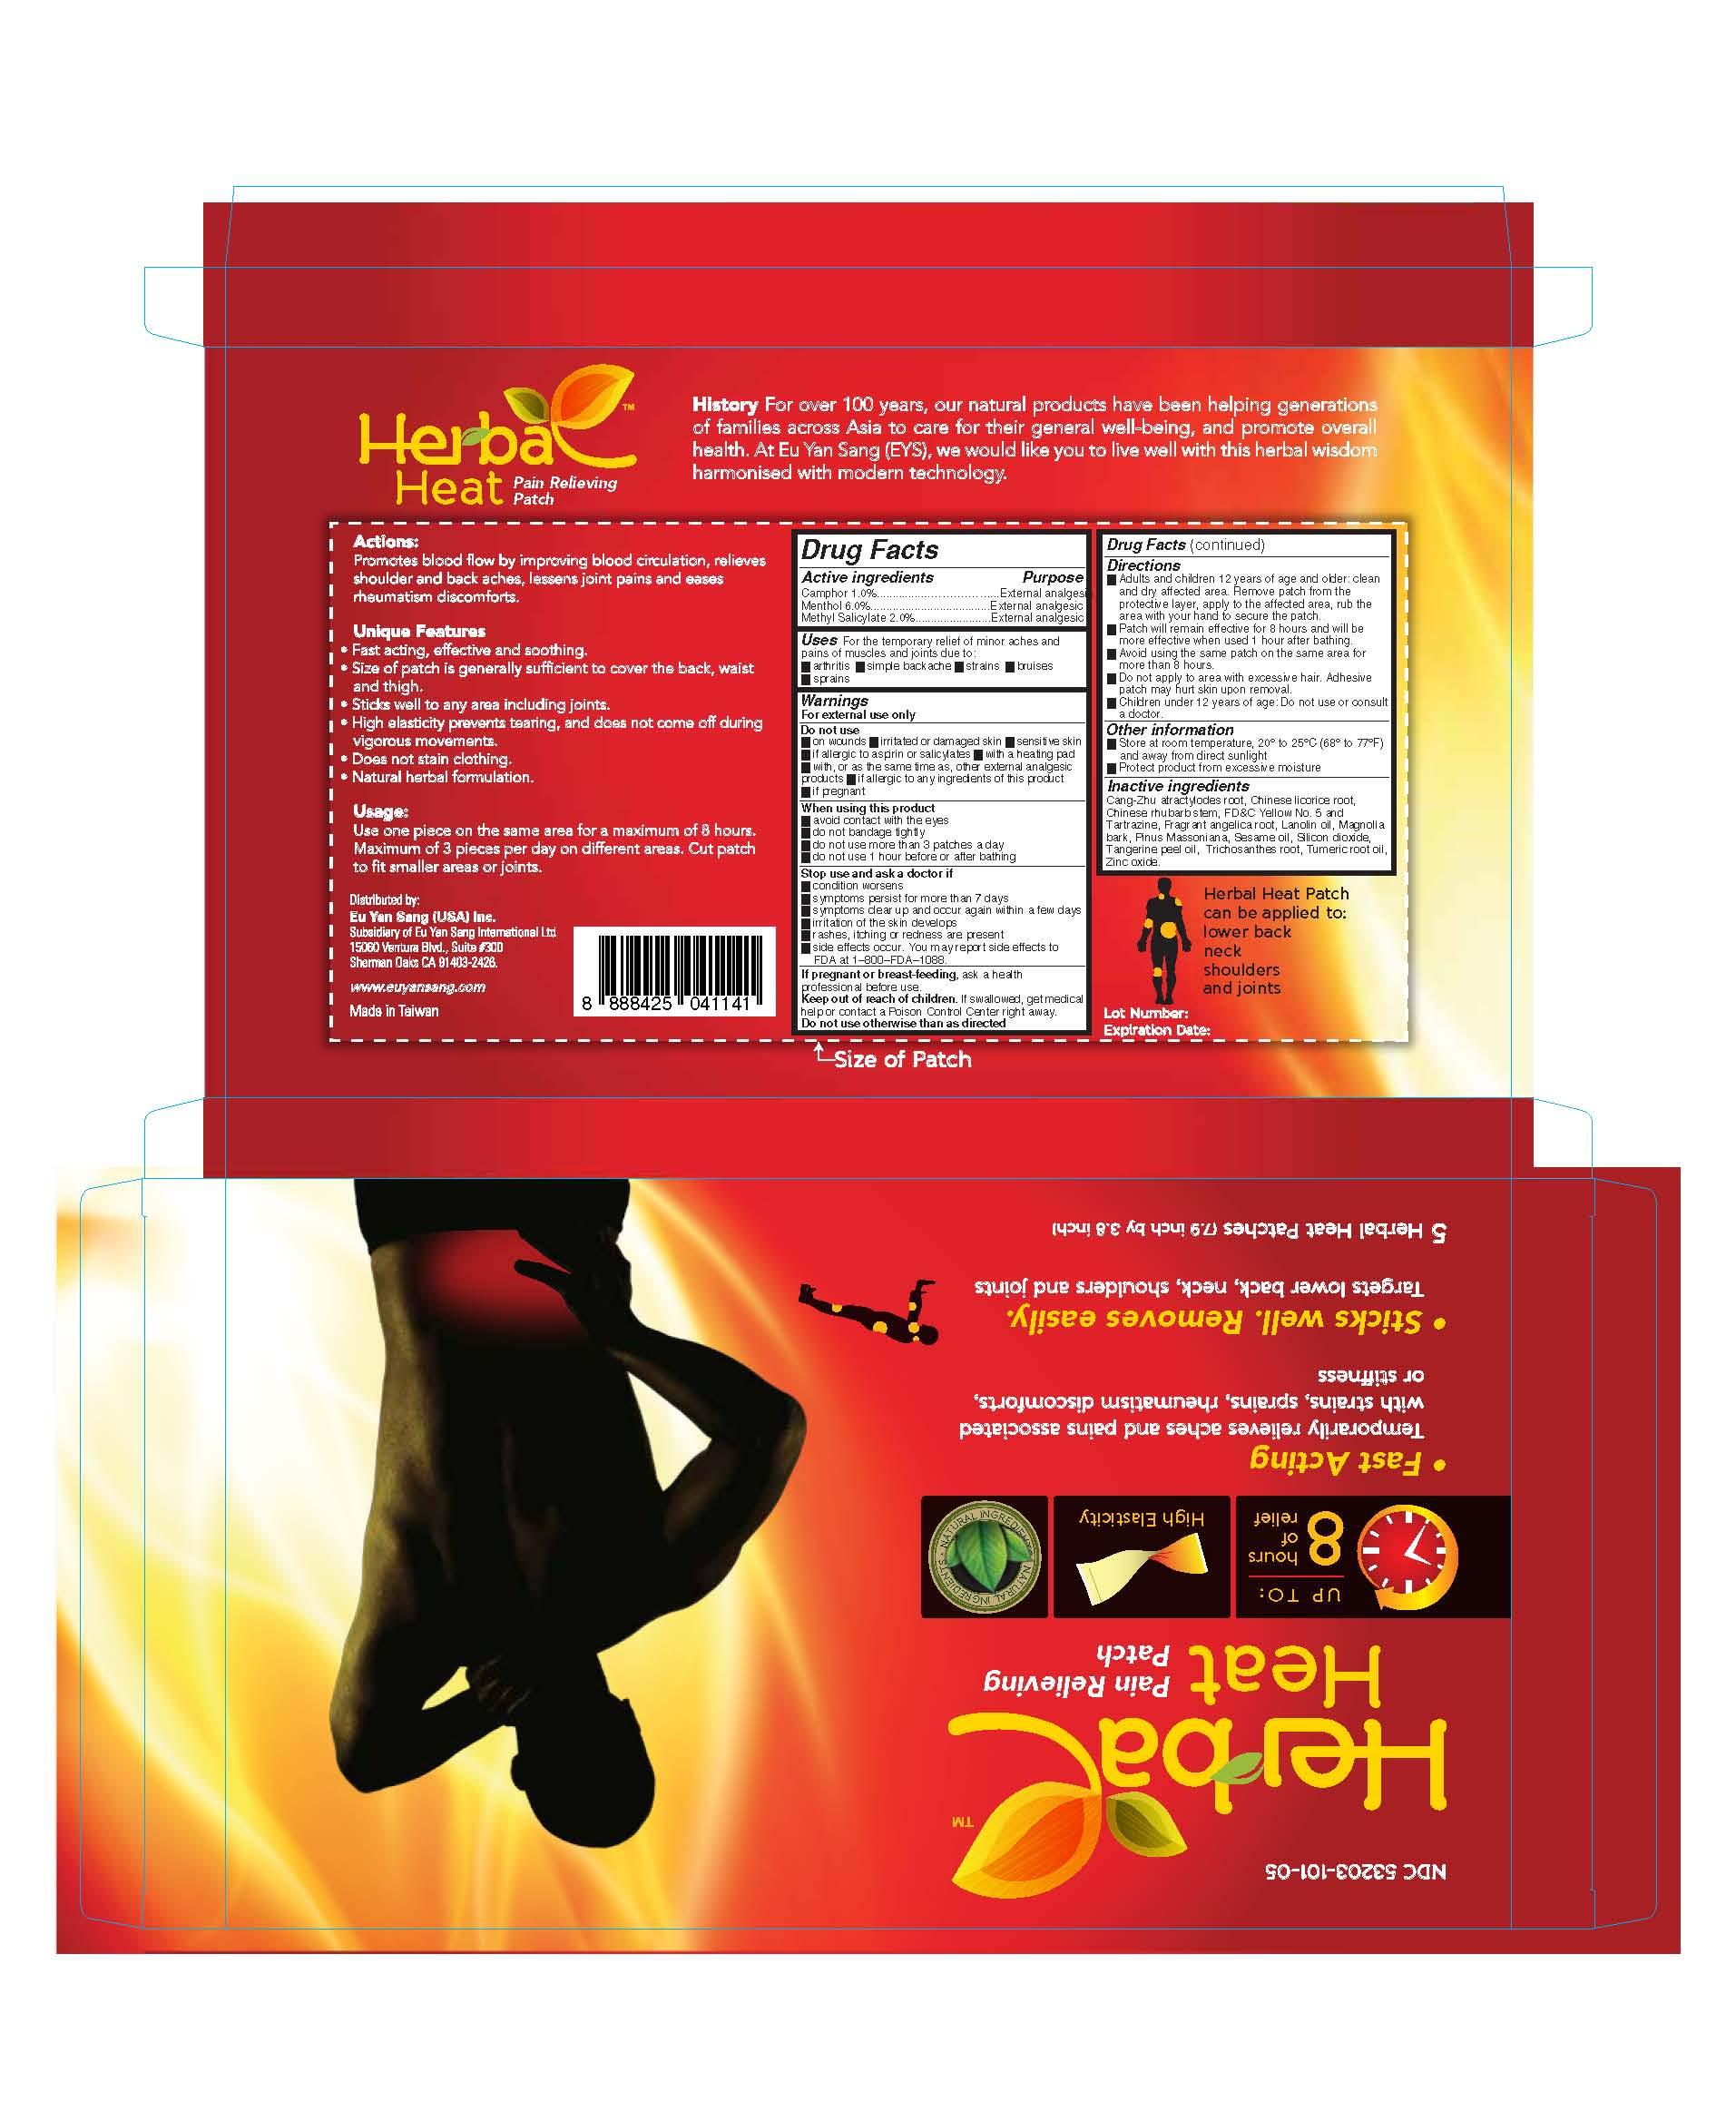 Herbal Heat (Pain Relieving Patch) Patch [Eu Yan Sang (Usa) Inc]